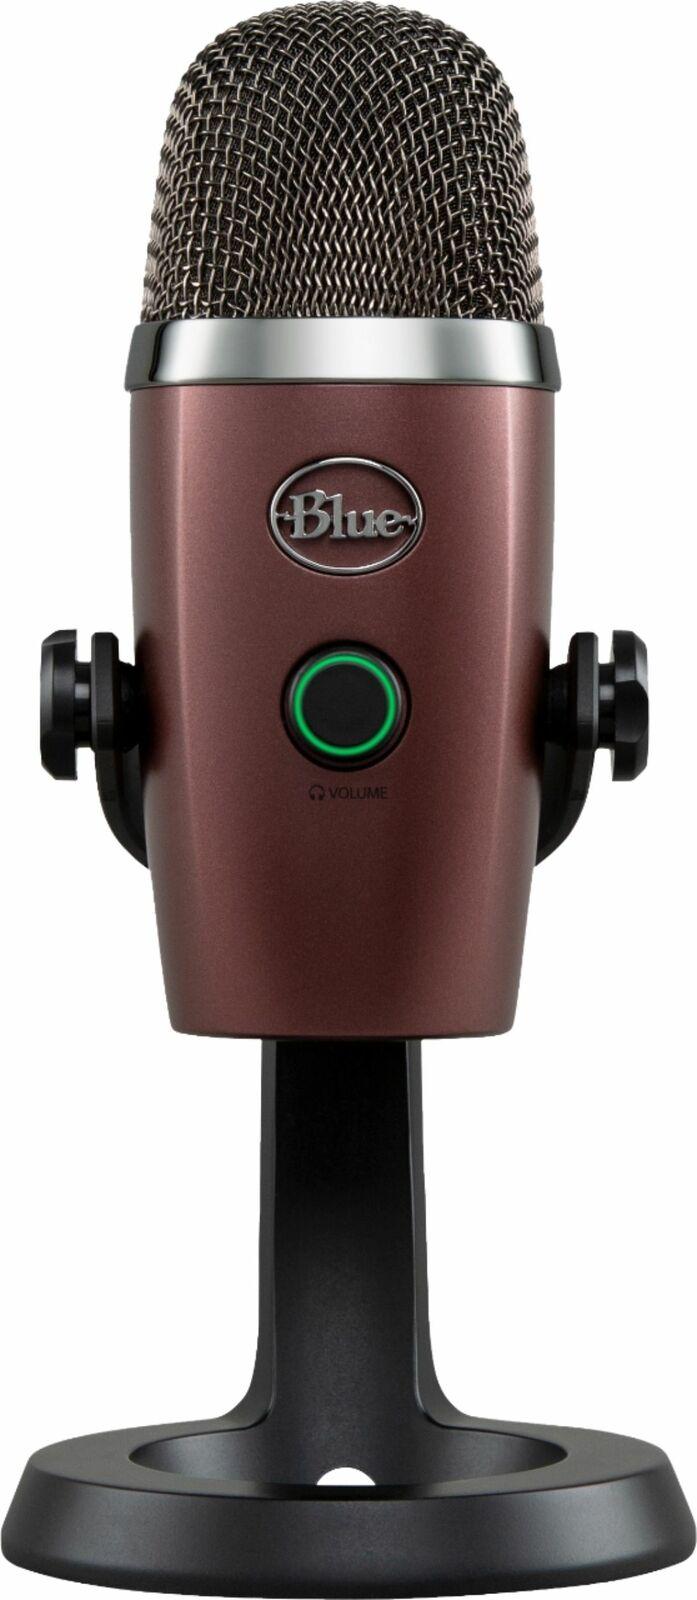 NEW Blue Yeti Nano Premium USB Mic for Recording and Streami